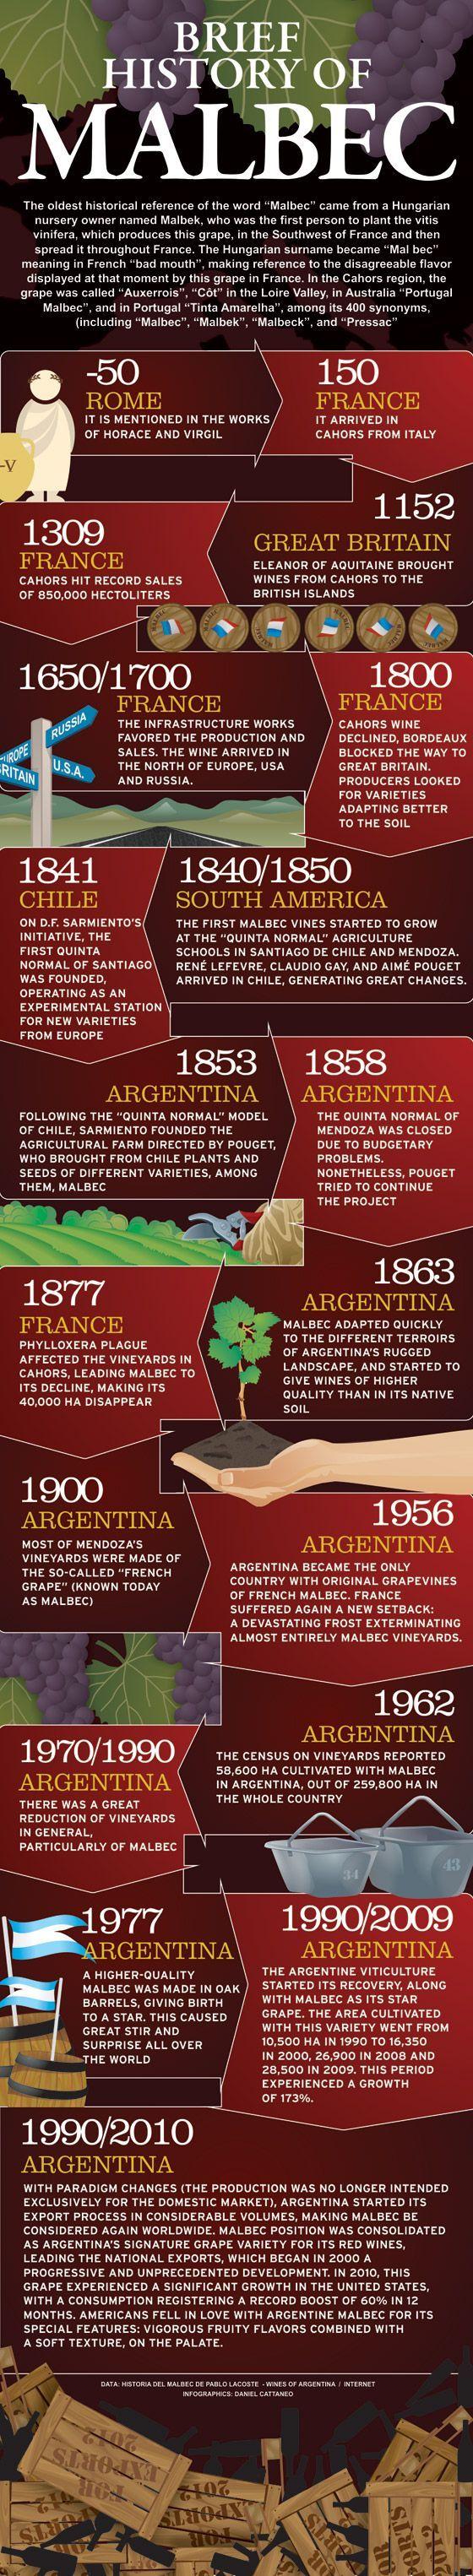 Historia Concisa de la uva Malbec | WineSur - October 9, 2013 #wine #malbec #avacationrental4me repin from http://winesur.com (scheduled via http://www.tailwindapp.com?utm_source=pinterest&utm_medium=twpin&utm_content=post134022785&utm_campaign=scheduler_attribution)